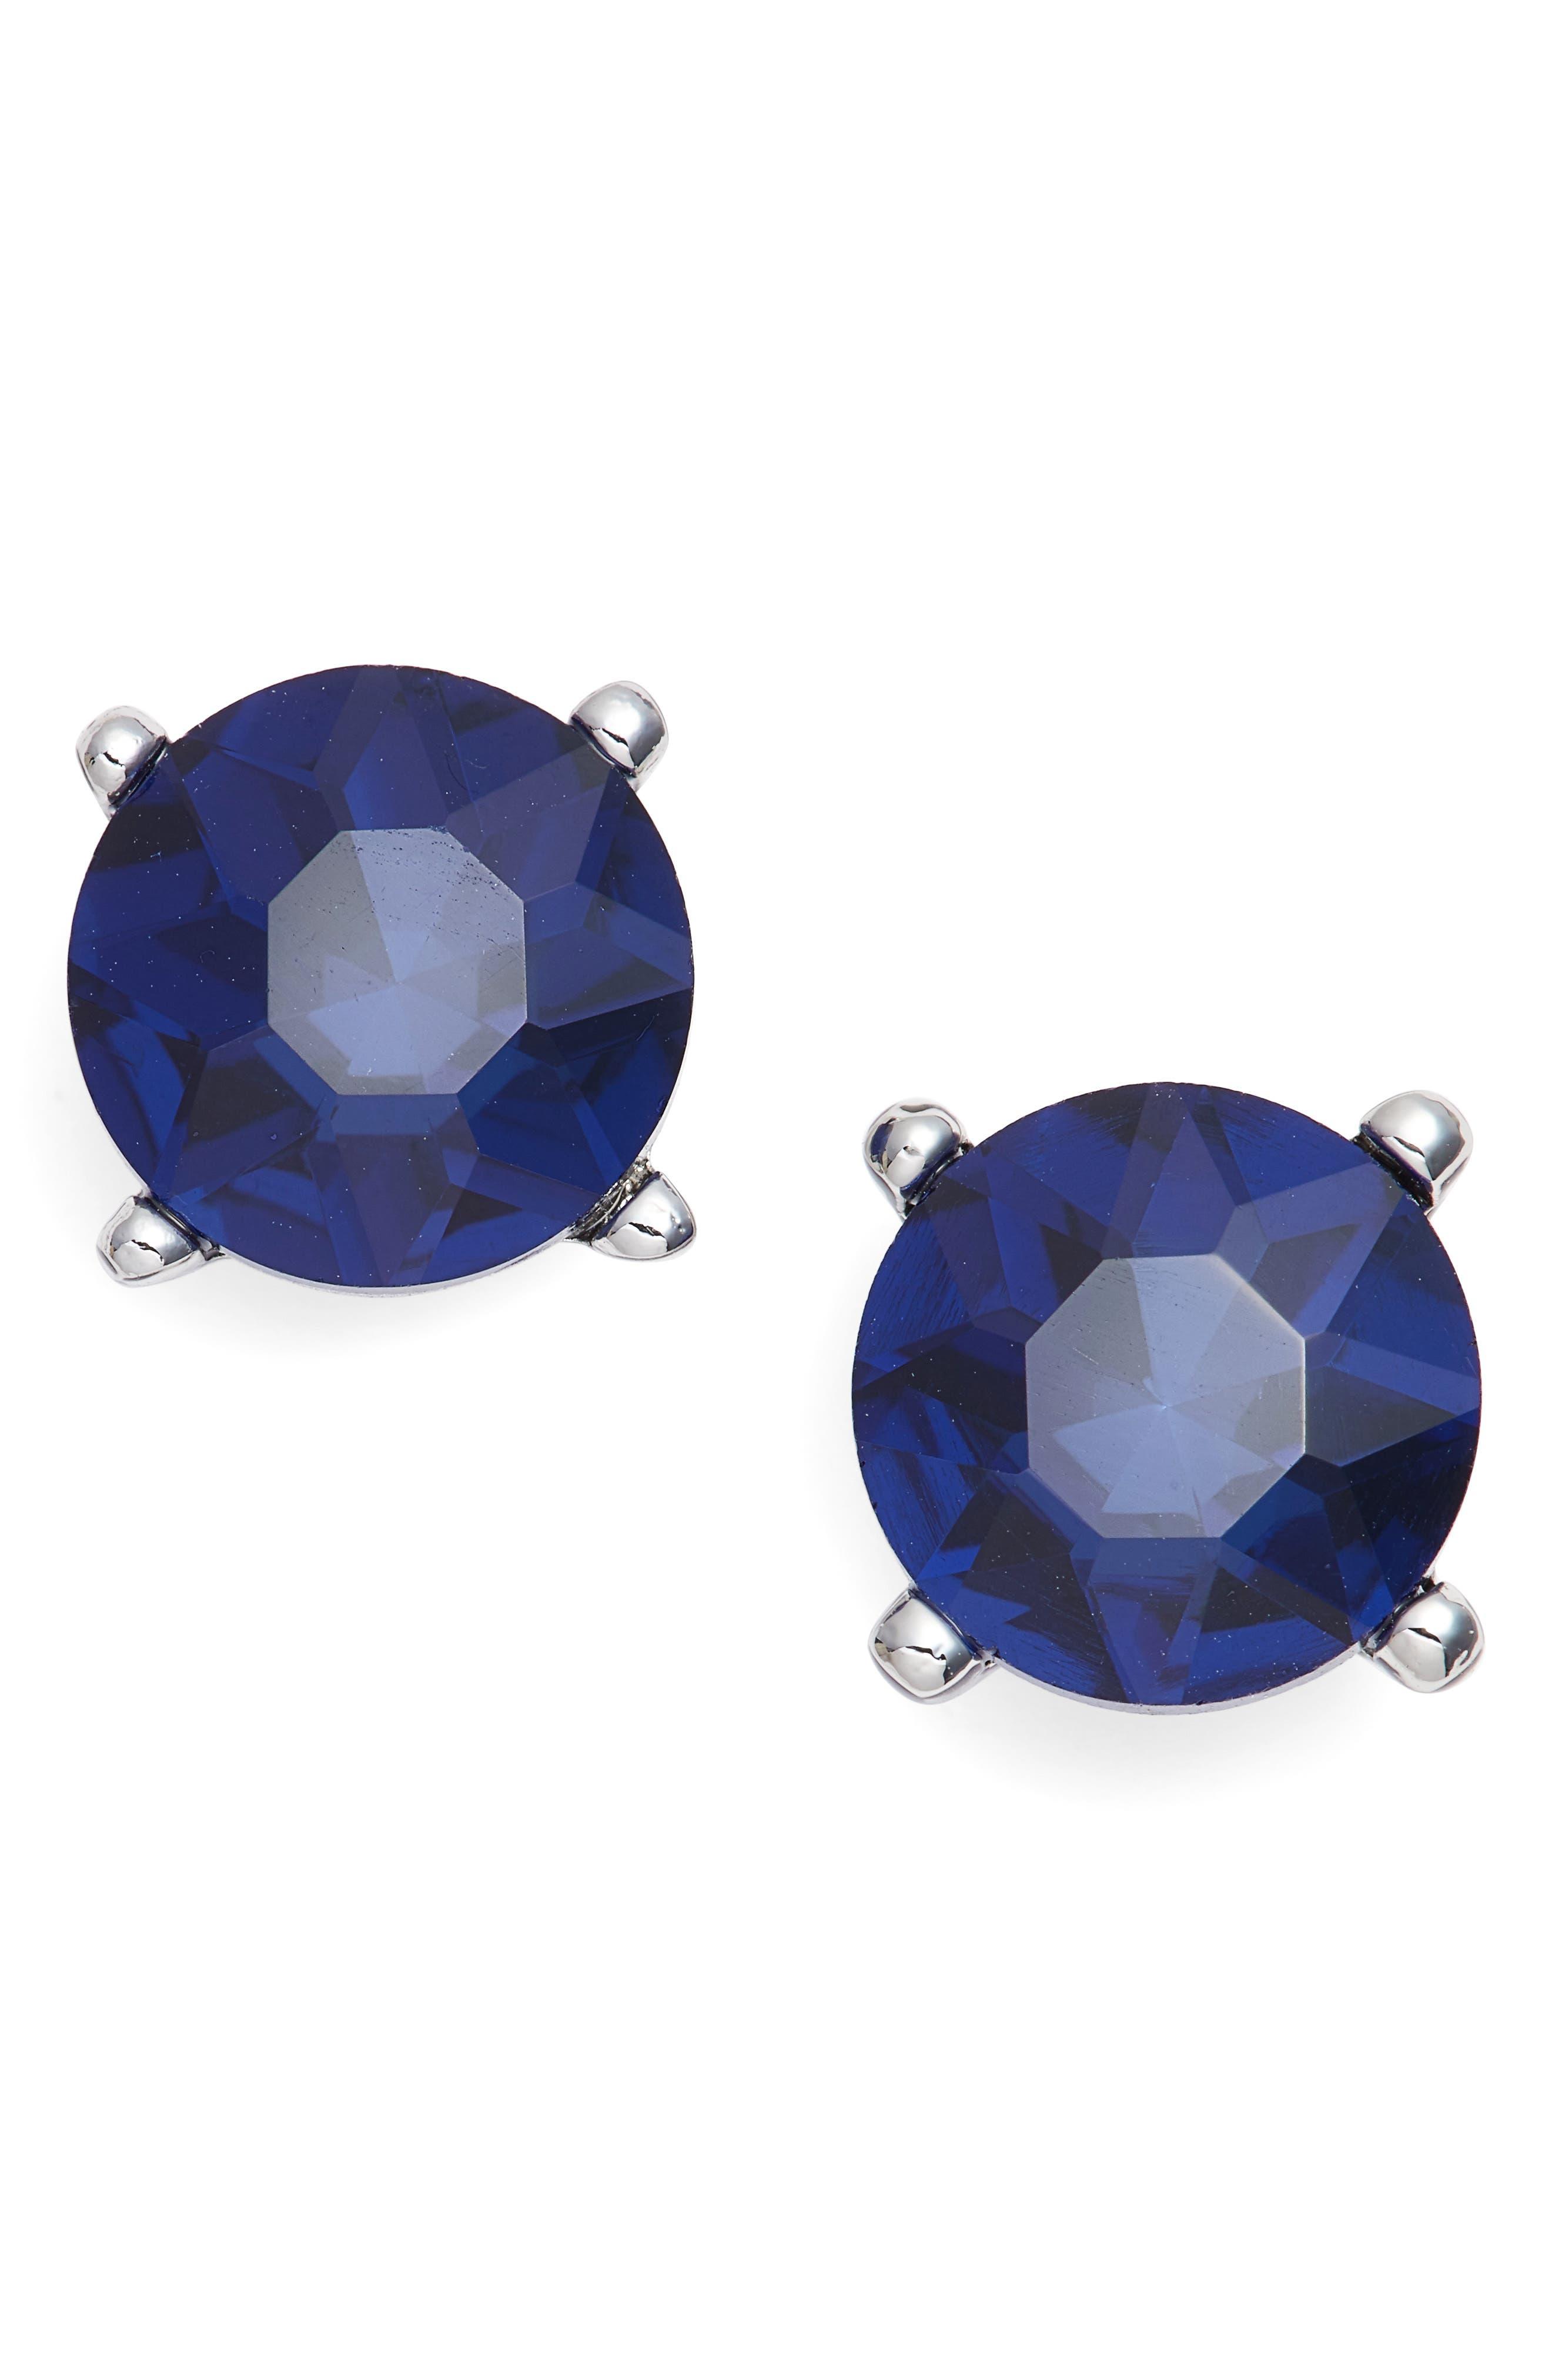 Jewel Stud Earrings,                         Main,                         color, 040